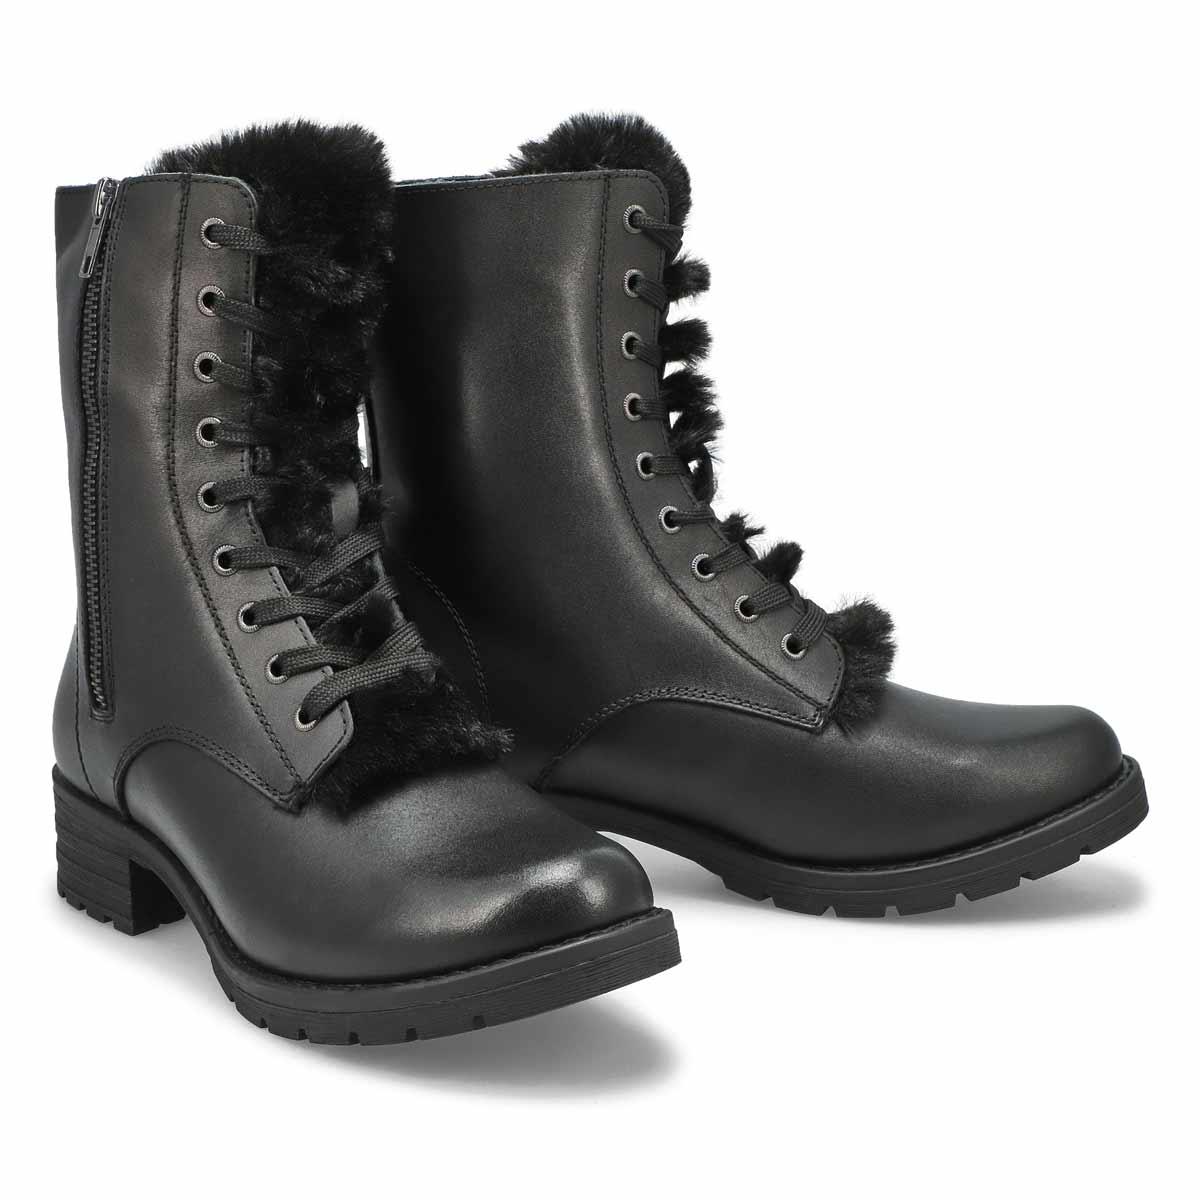 Lds Daphnie black combat boot